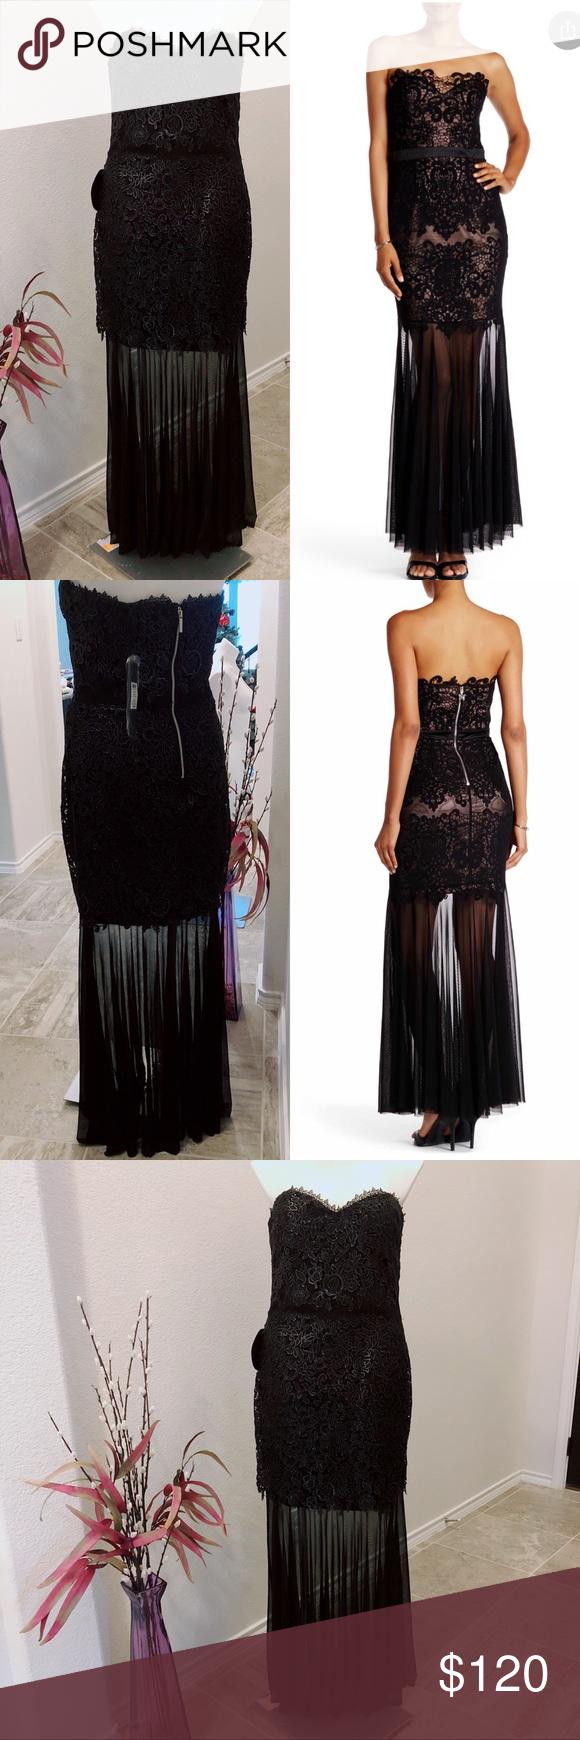 Lipsy London Vip Lurex Maxi Dress Size 14 Black Lipsy Dresses Black Strapless Maxi Dress Dresses [ 1740 x 580 Pixel ]